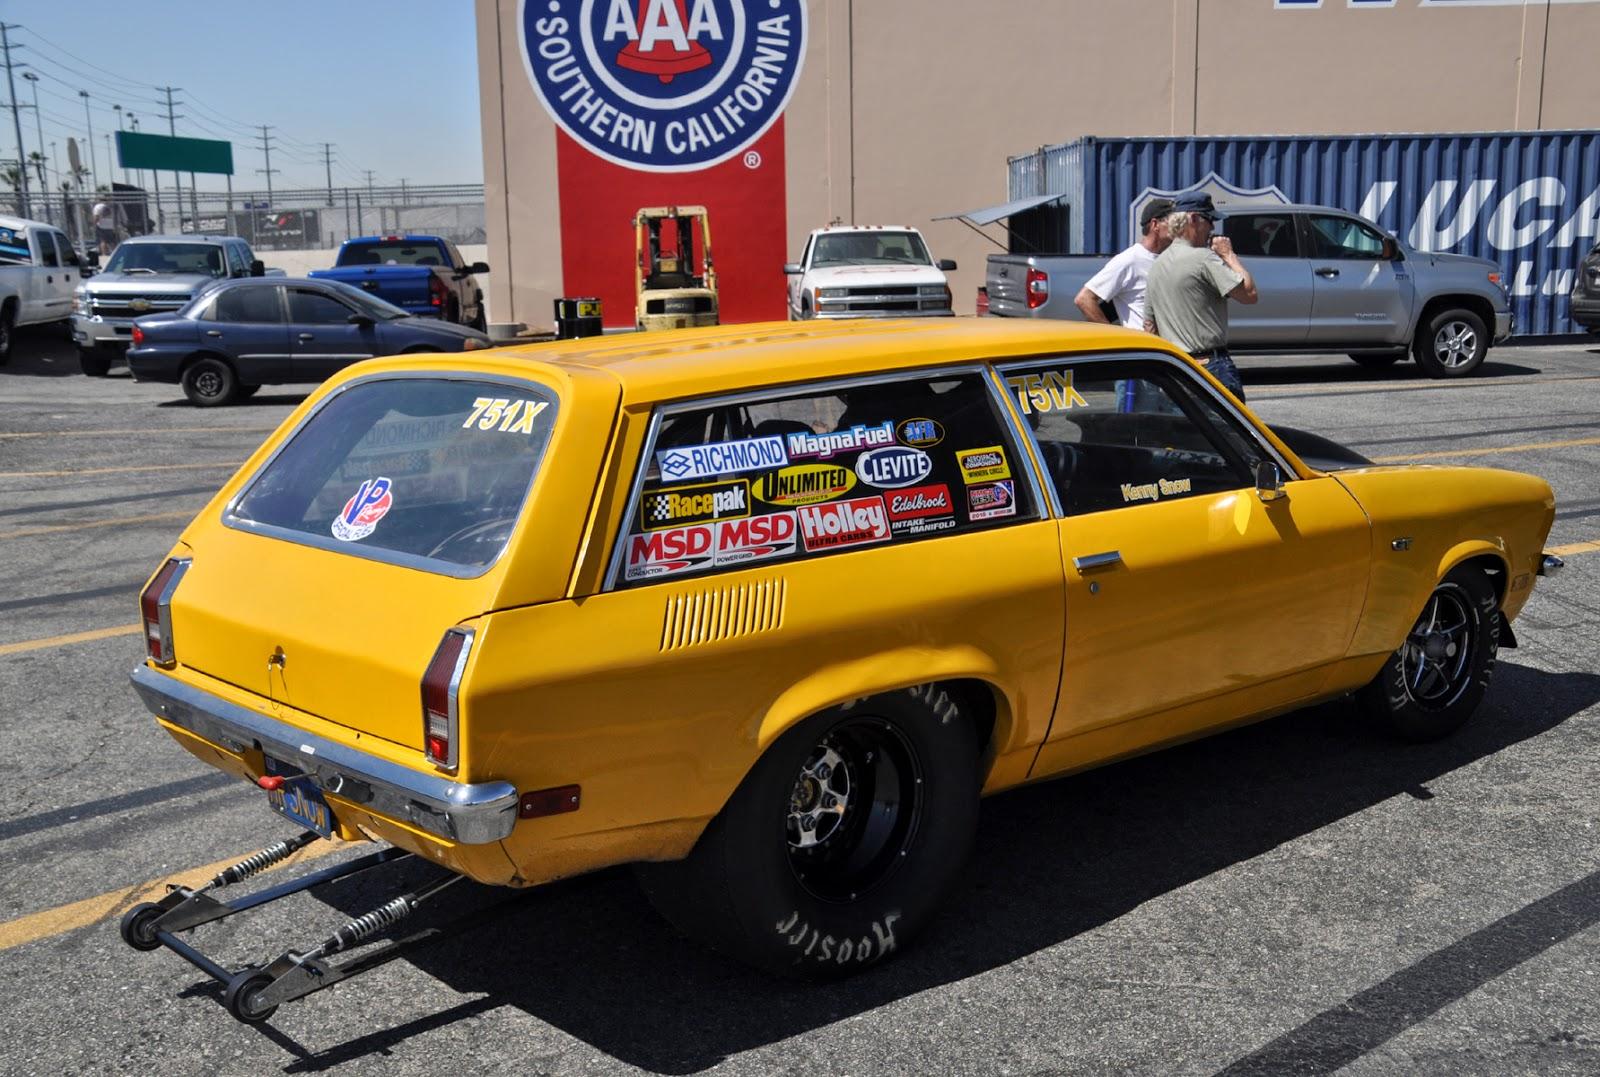 Vega station wagon    who knew they were still getting drag raced